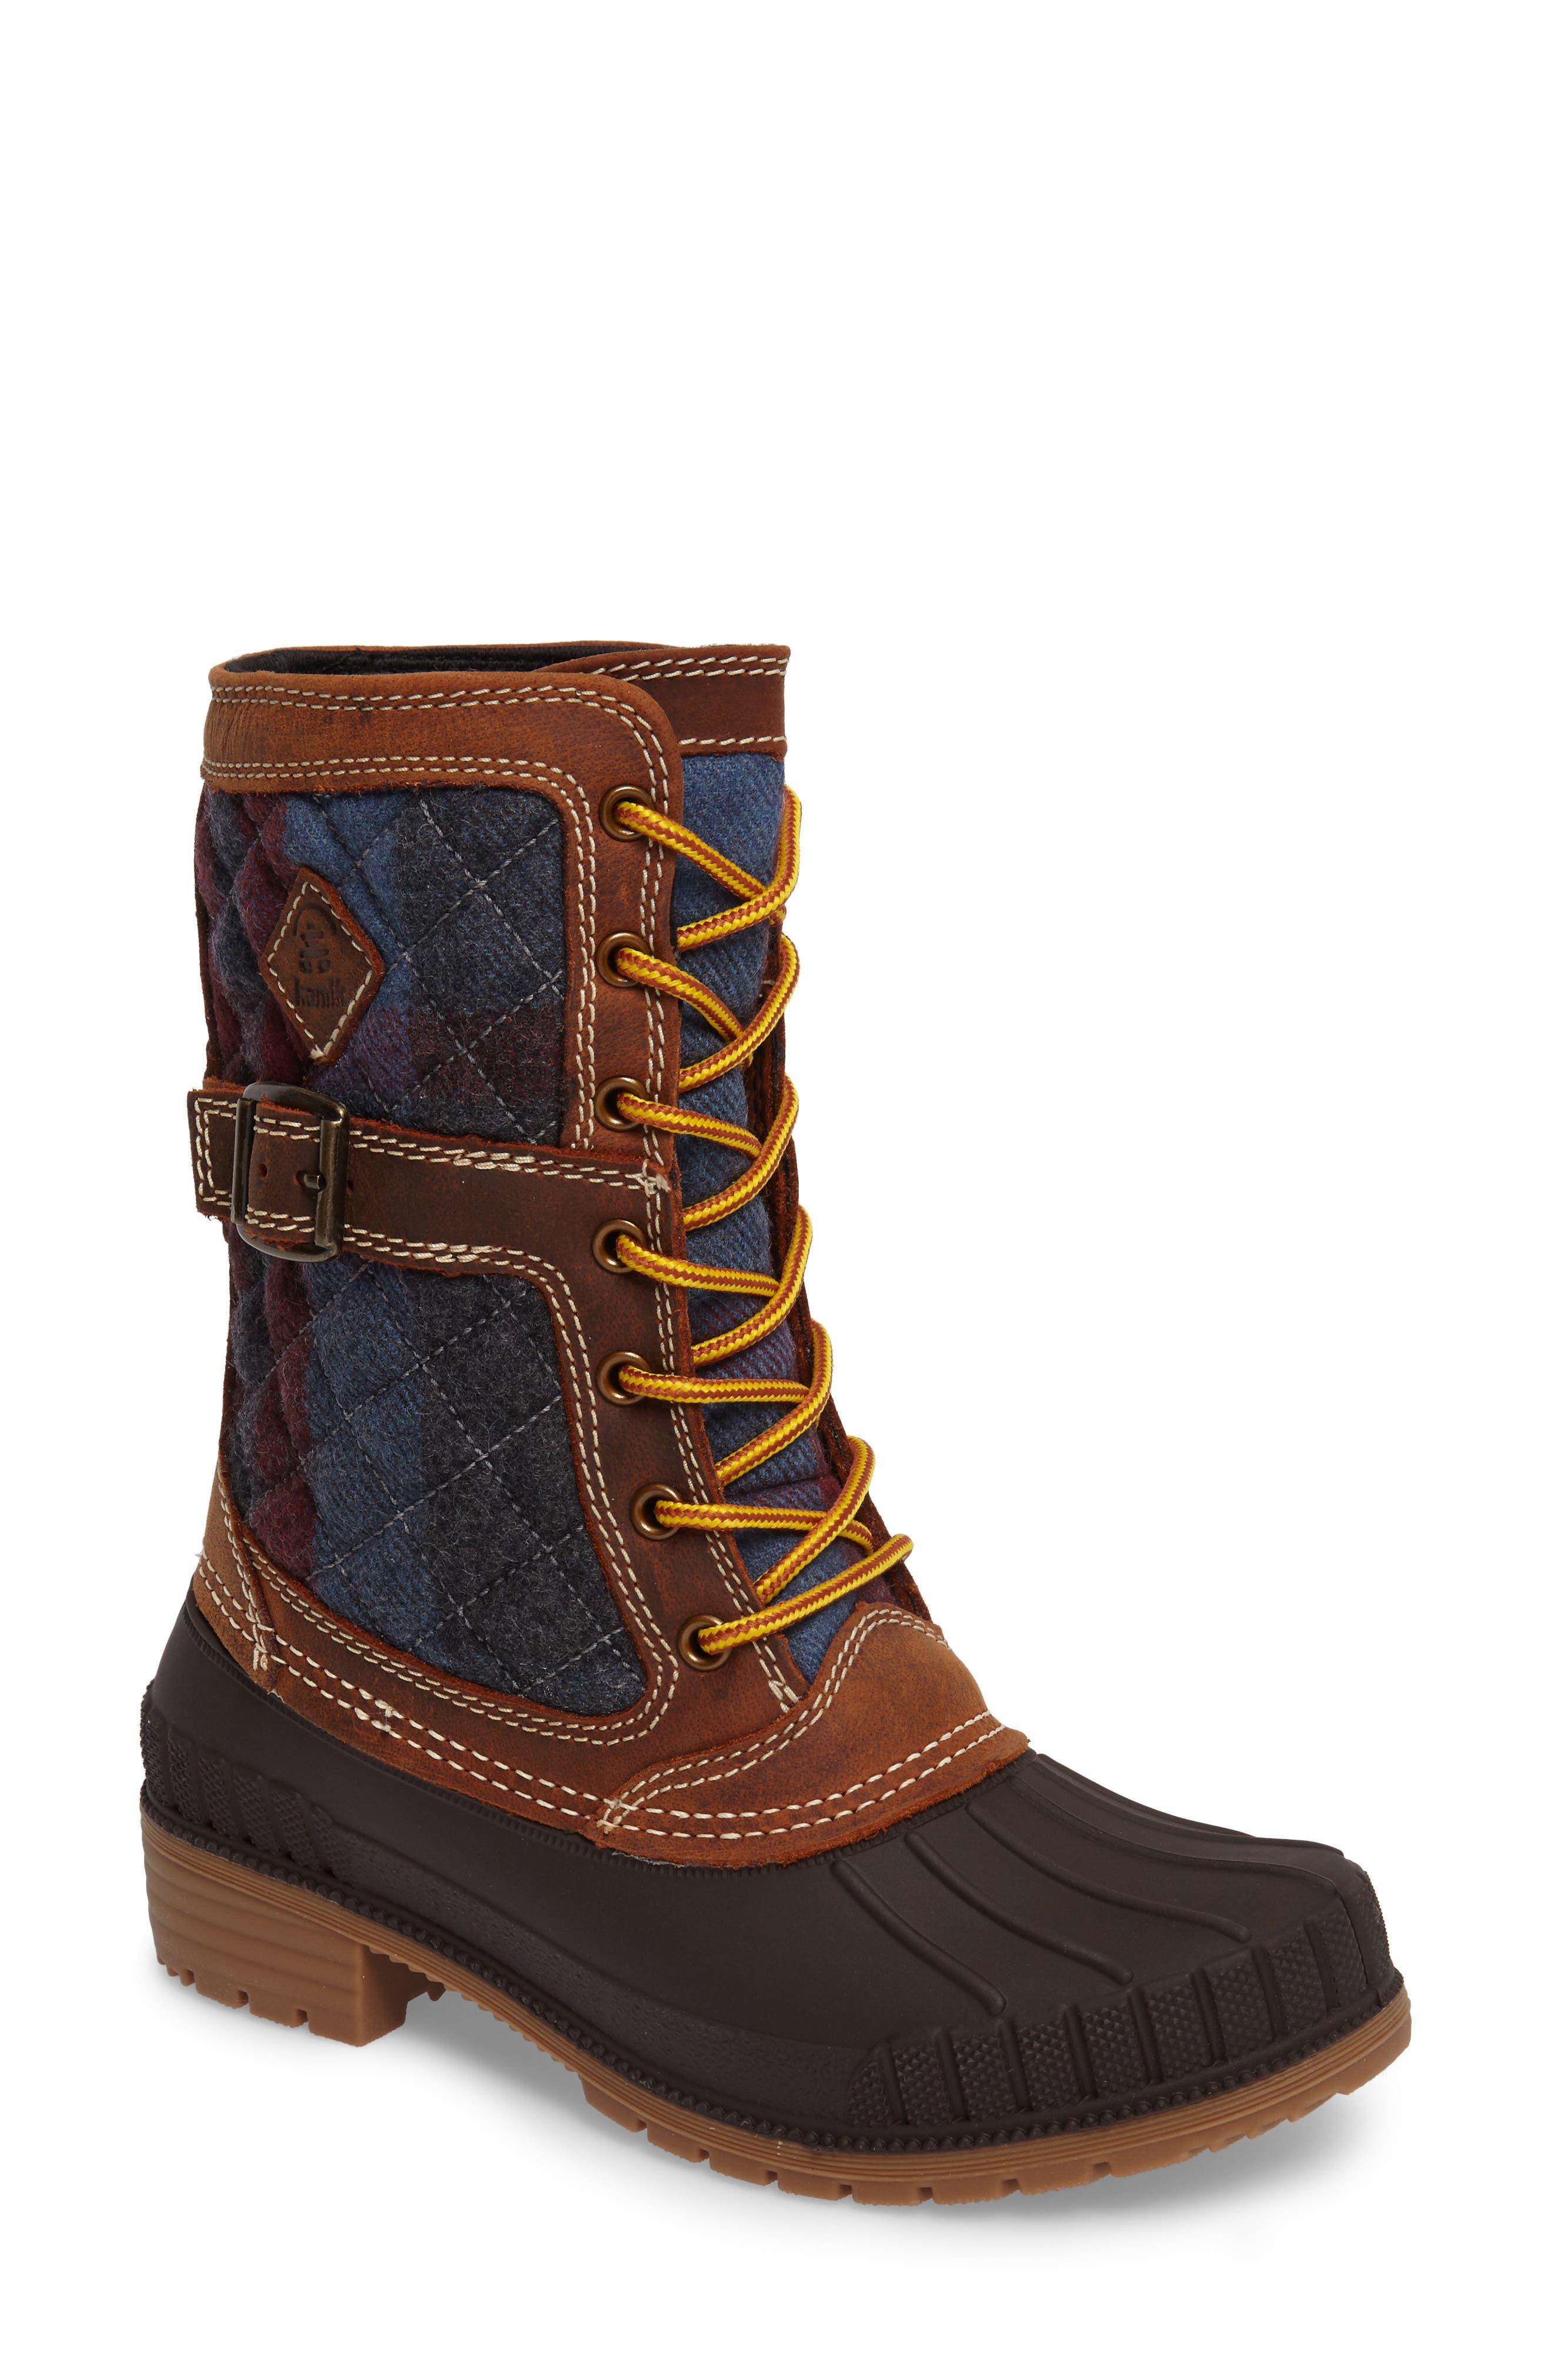 Alternate Image 1 Selected - Kamik Sienna Boot (Women)